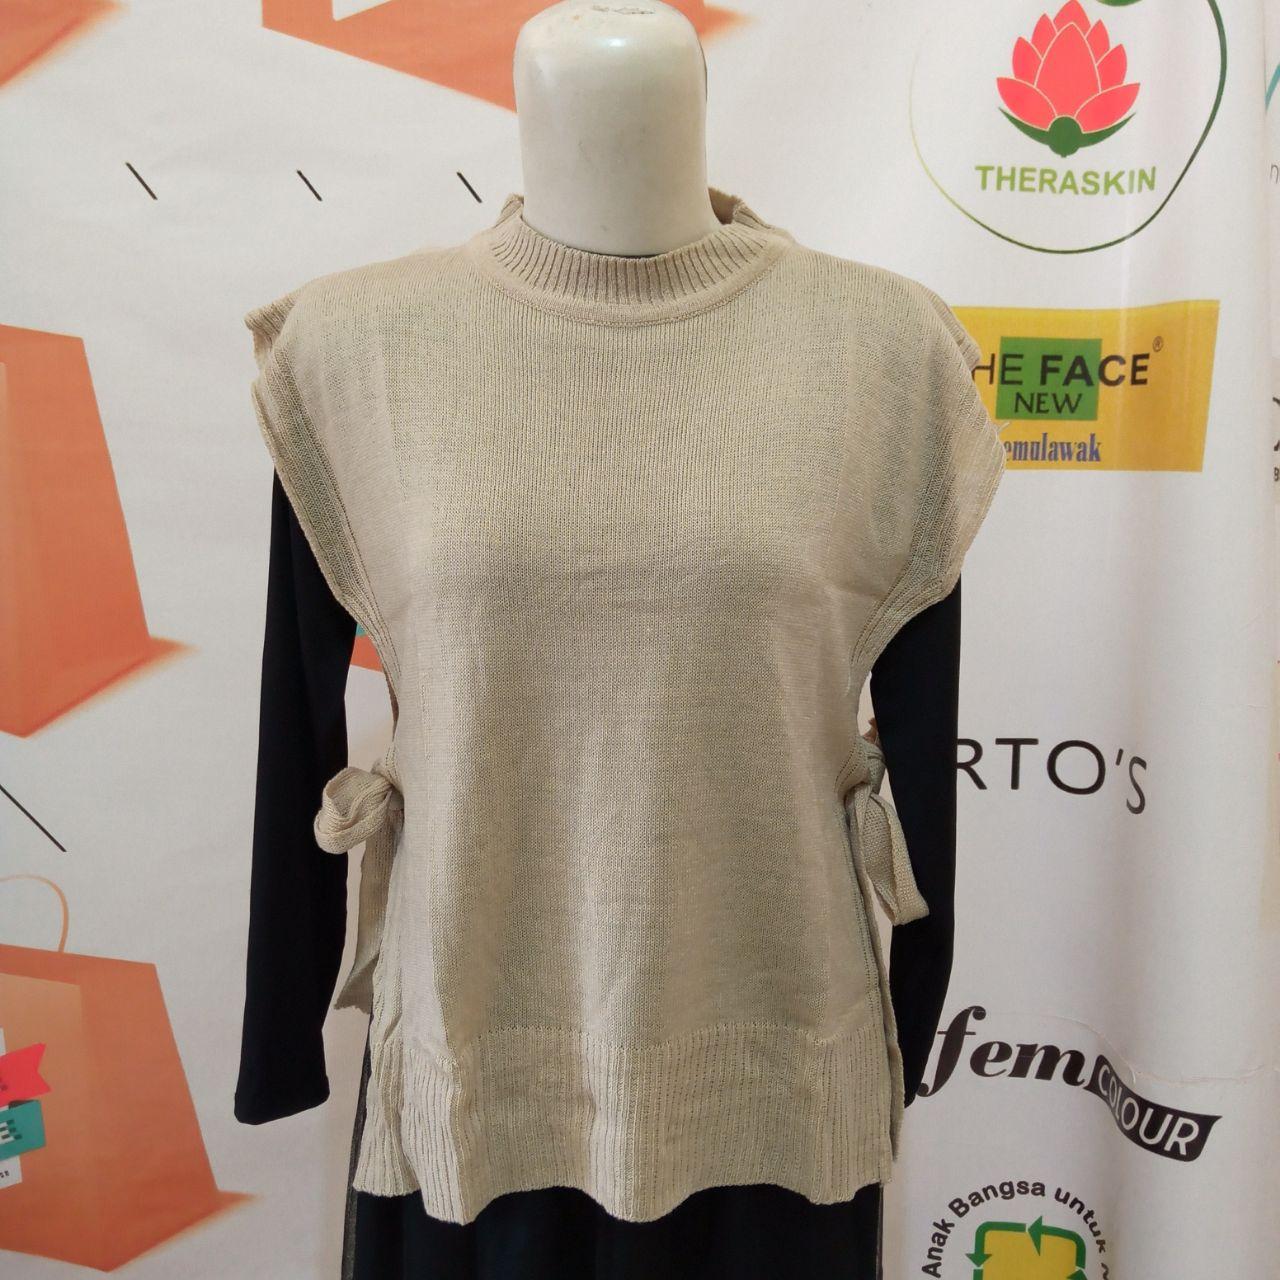 ini adalah Rajut Vest Andin Cream, size: L, material: knit, color: Cream, brand: vestknittindonesia, age_group: all ages, gender: female